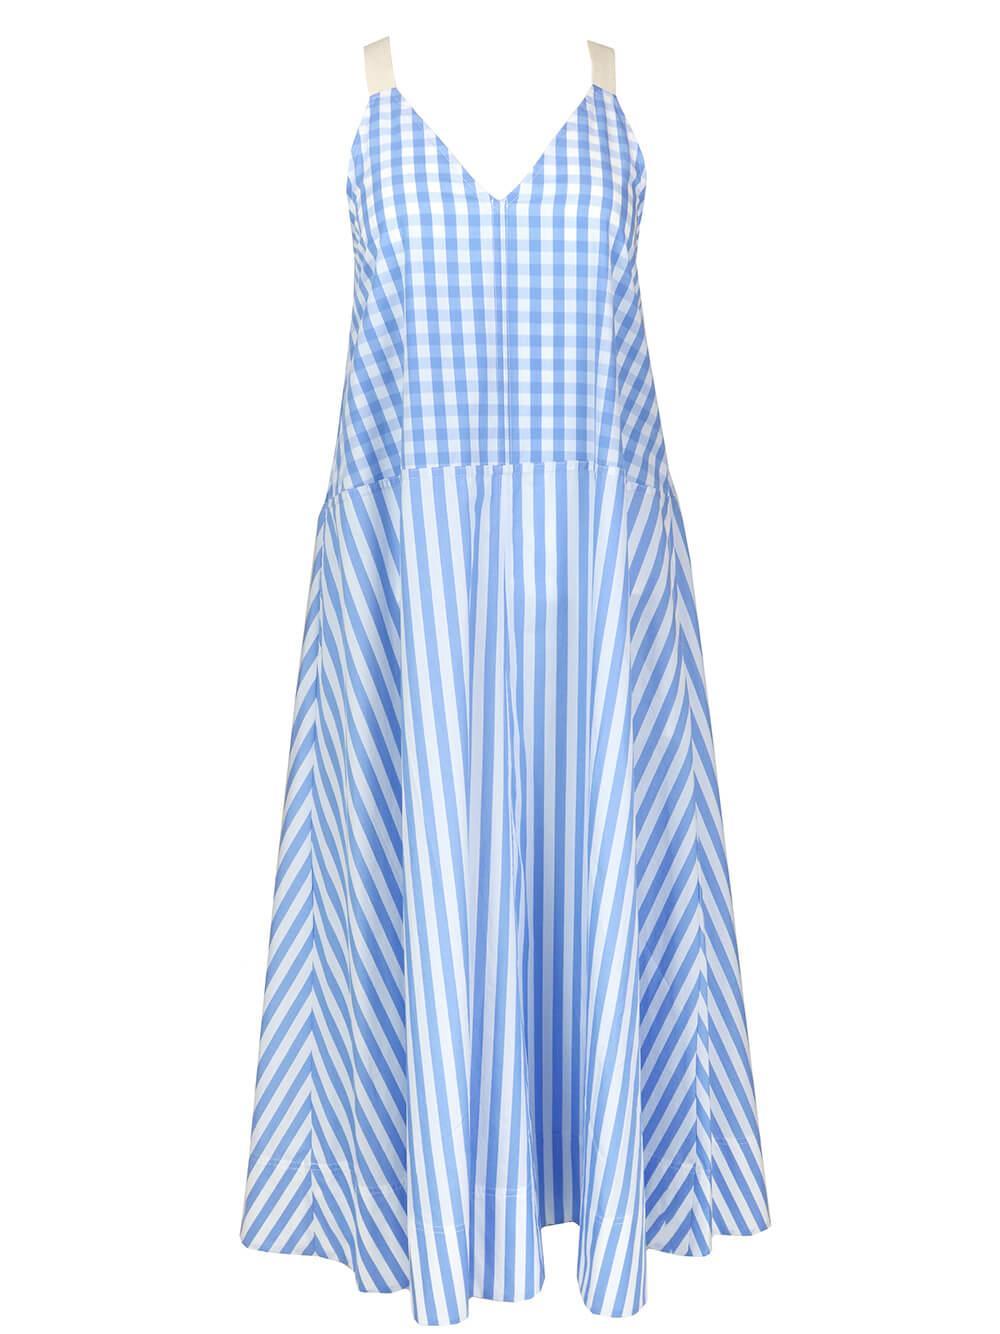 Stevie Apron Dress Item # M2101DR161